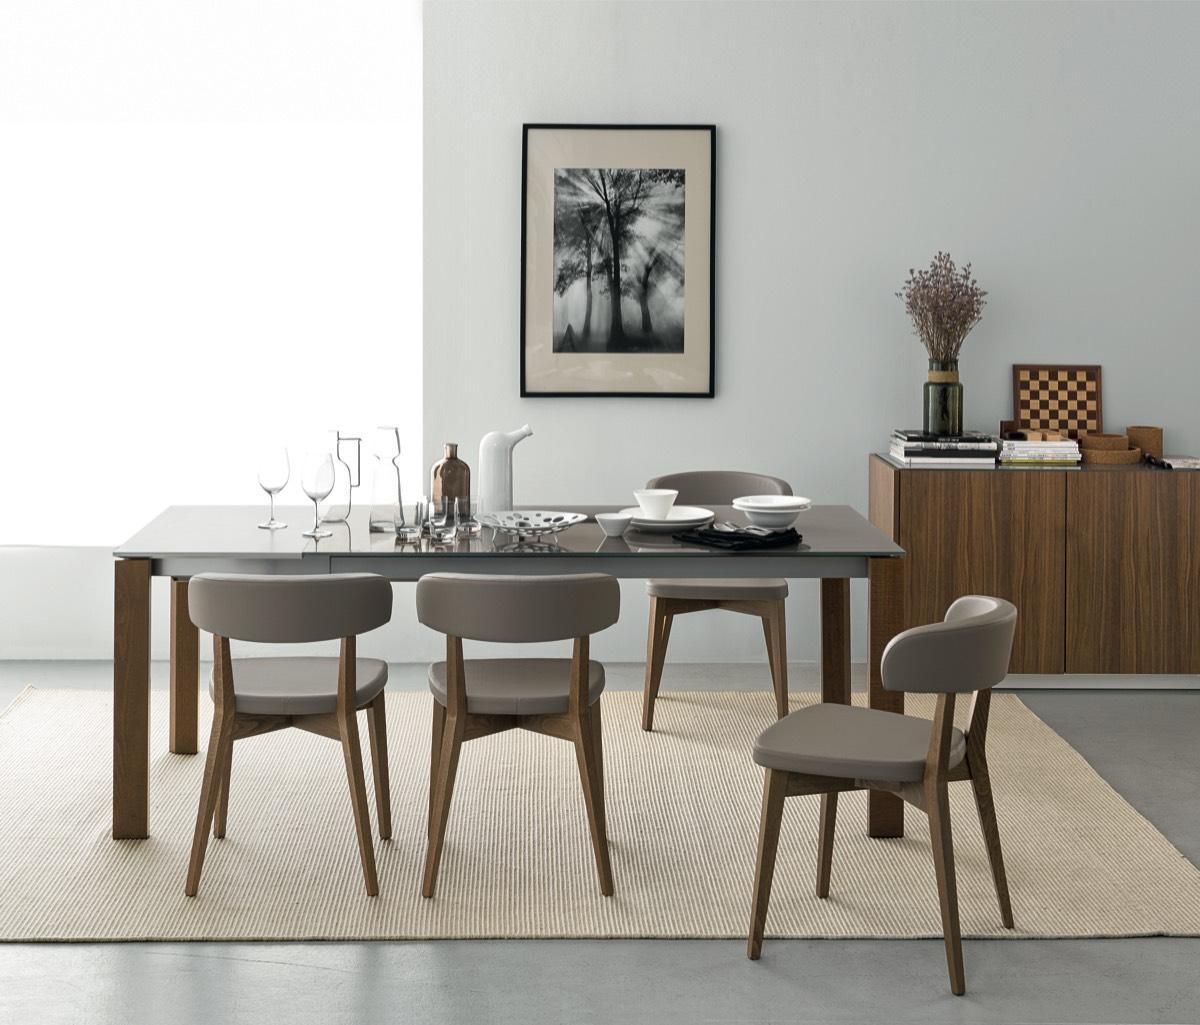 Sedie e tavoli per la casa mg sedie for Sedie e tavoli